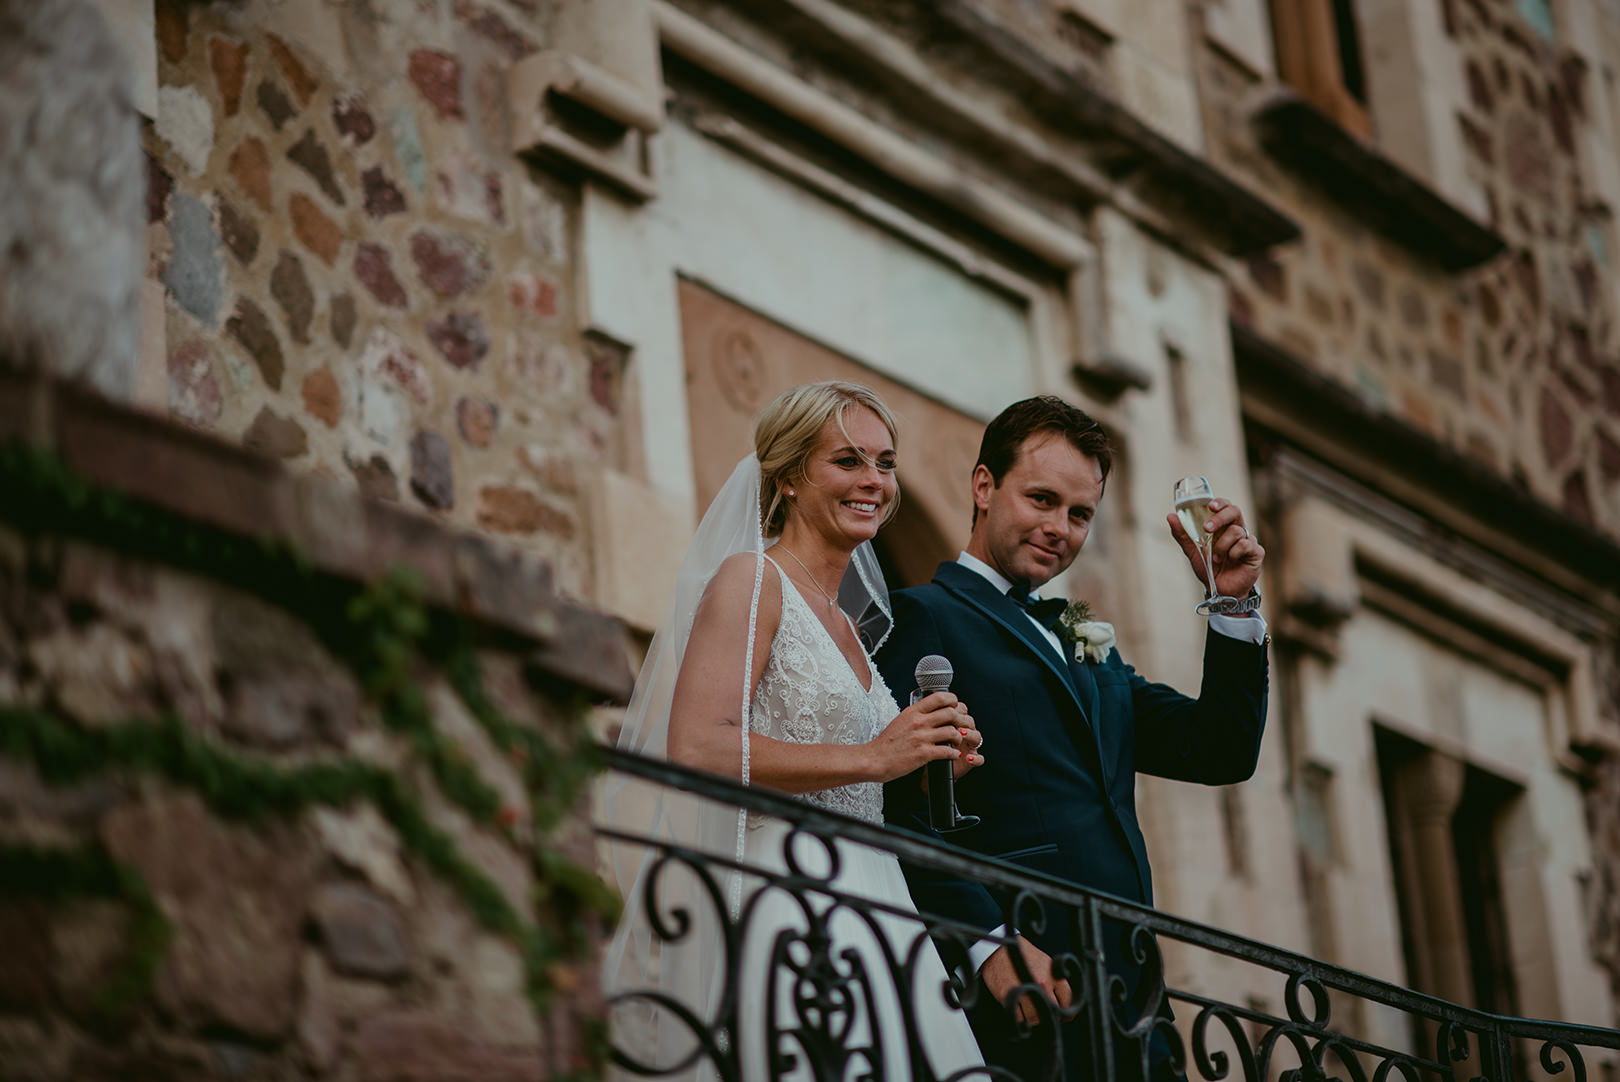 Bride and groom together at Chateau de la Napoule France